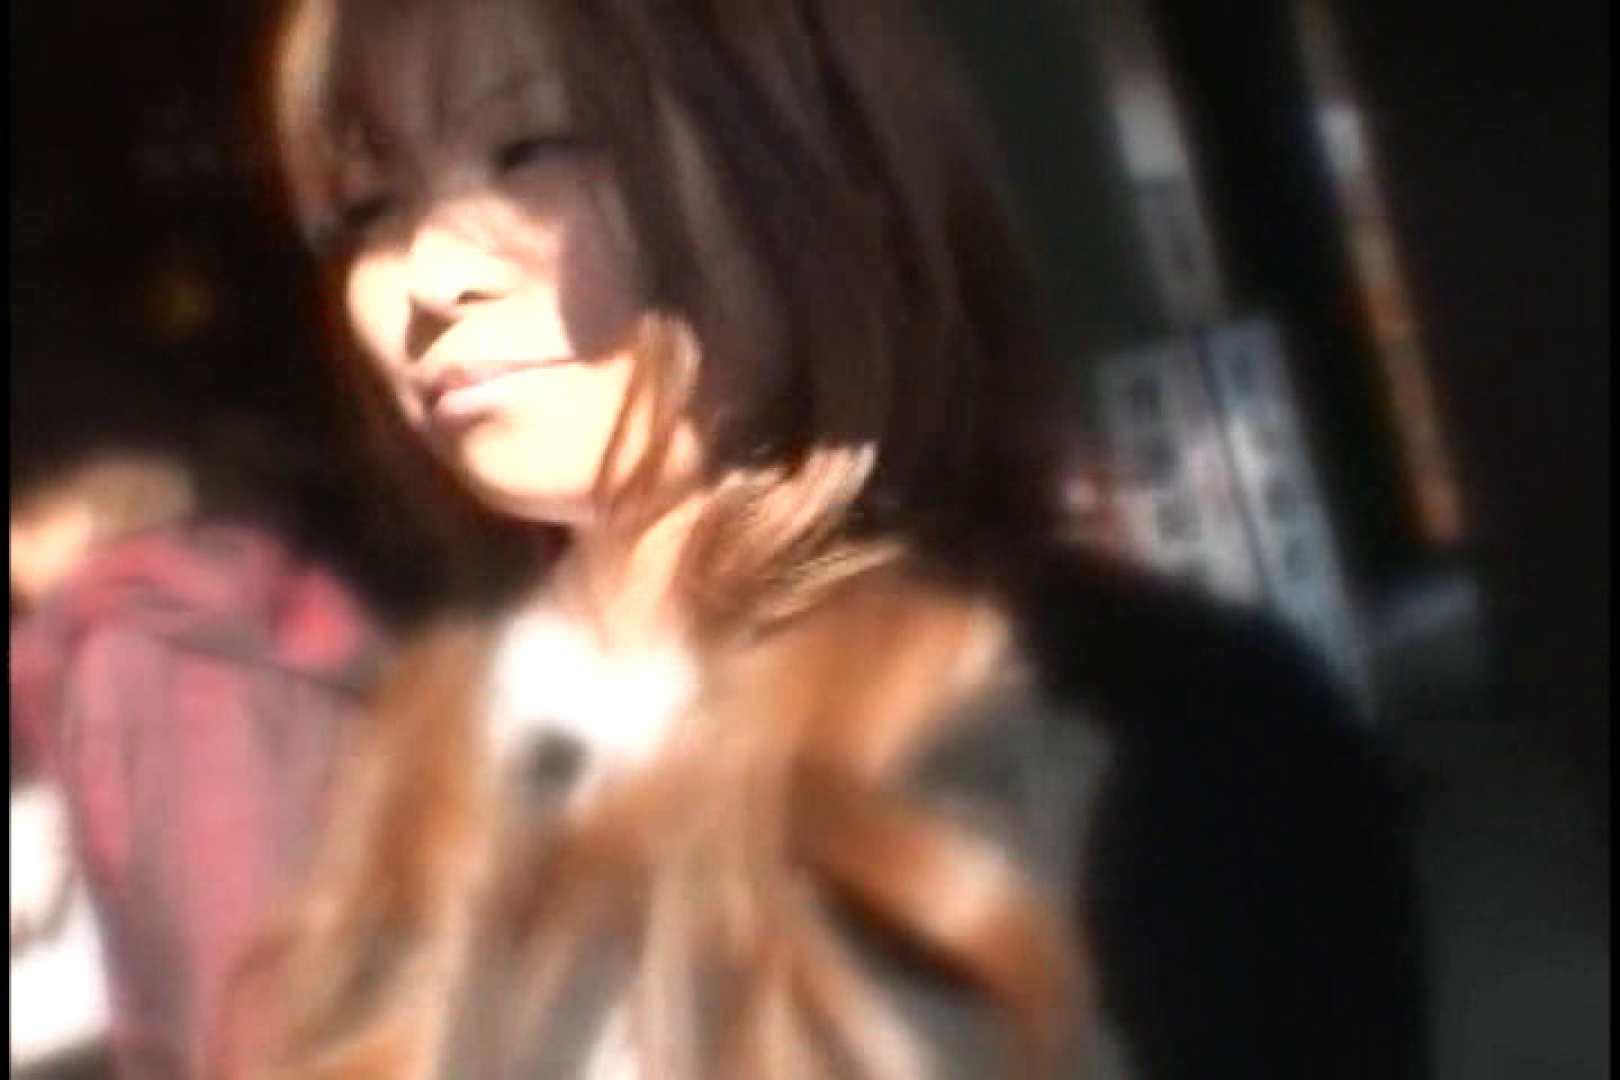 JDハンター全国ツアー vol.014 前編 女子大生のエロ動画 | 0  104PIX 1